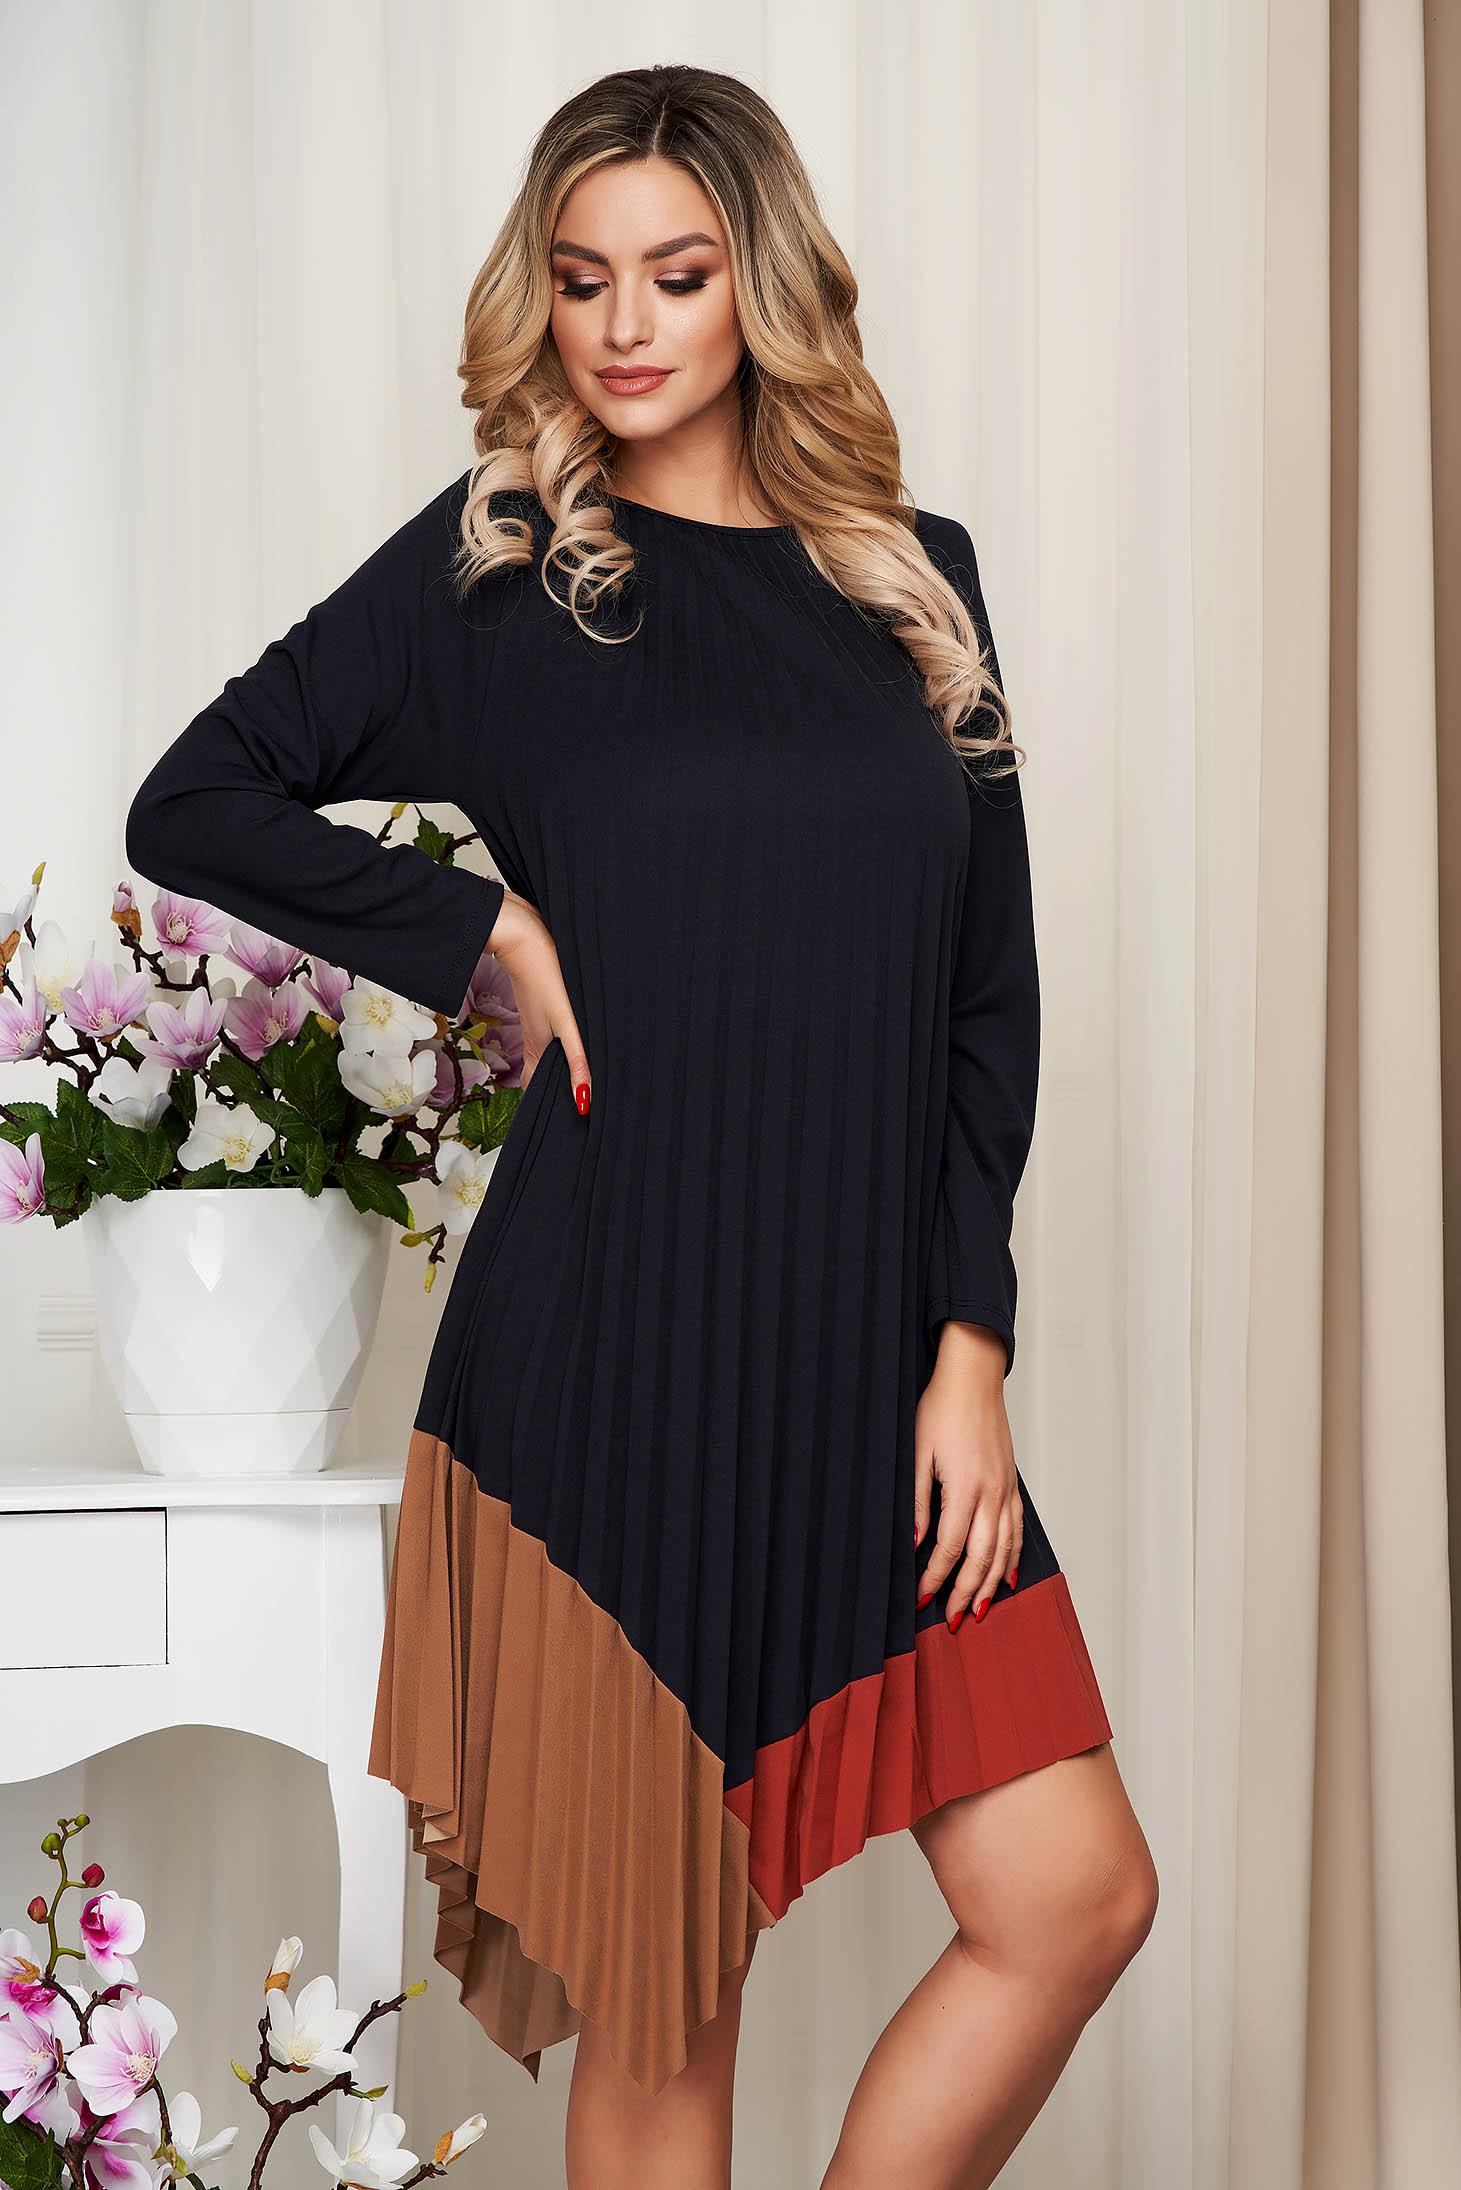 Darkblue dress loose fit asymmetrical folded up